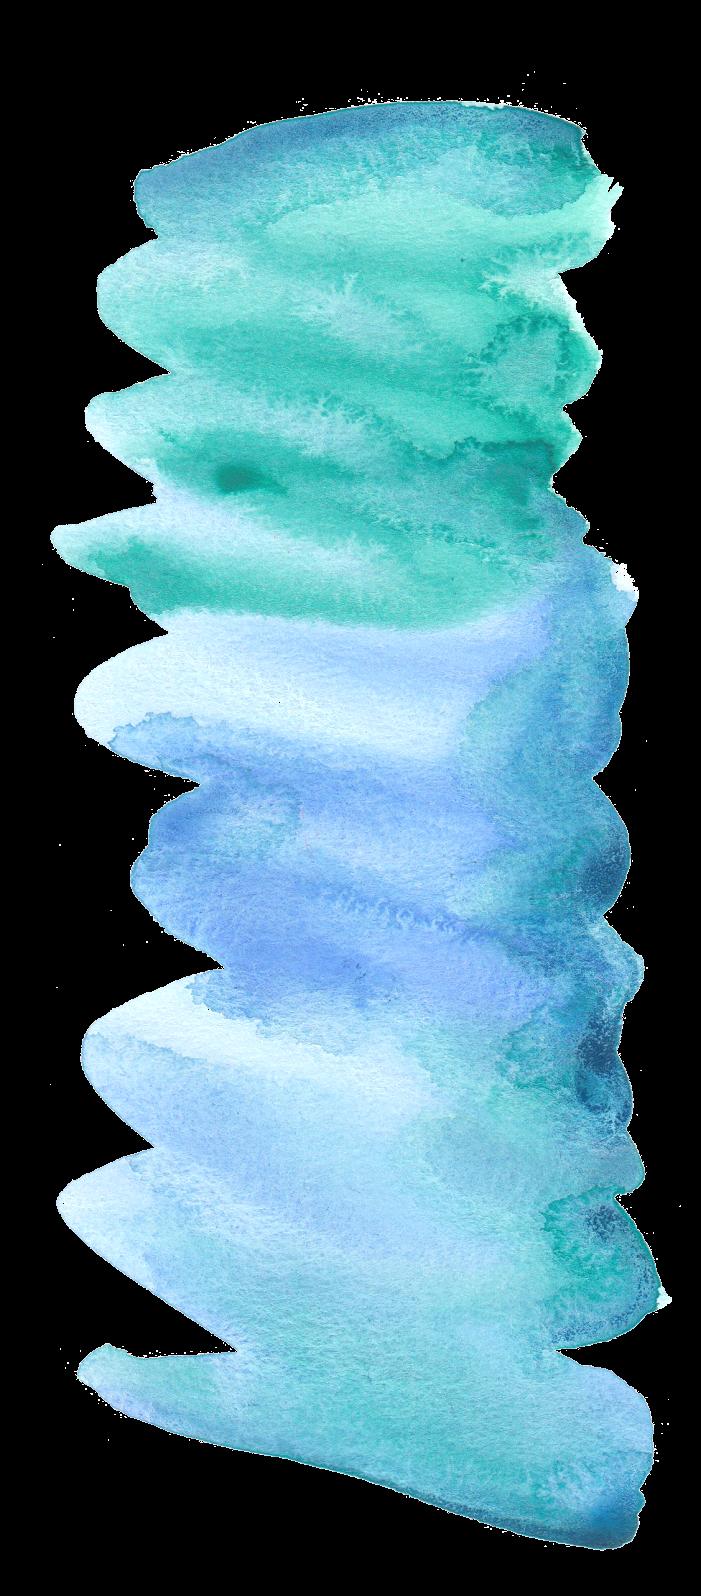 e8df8-hello-brio-watercolor-4-1.png